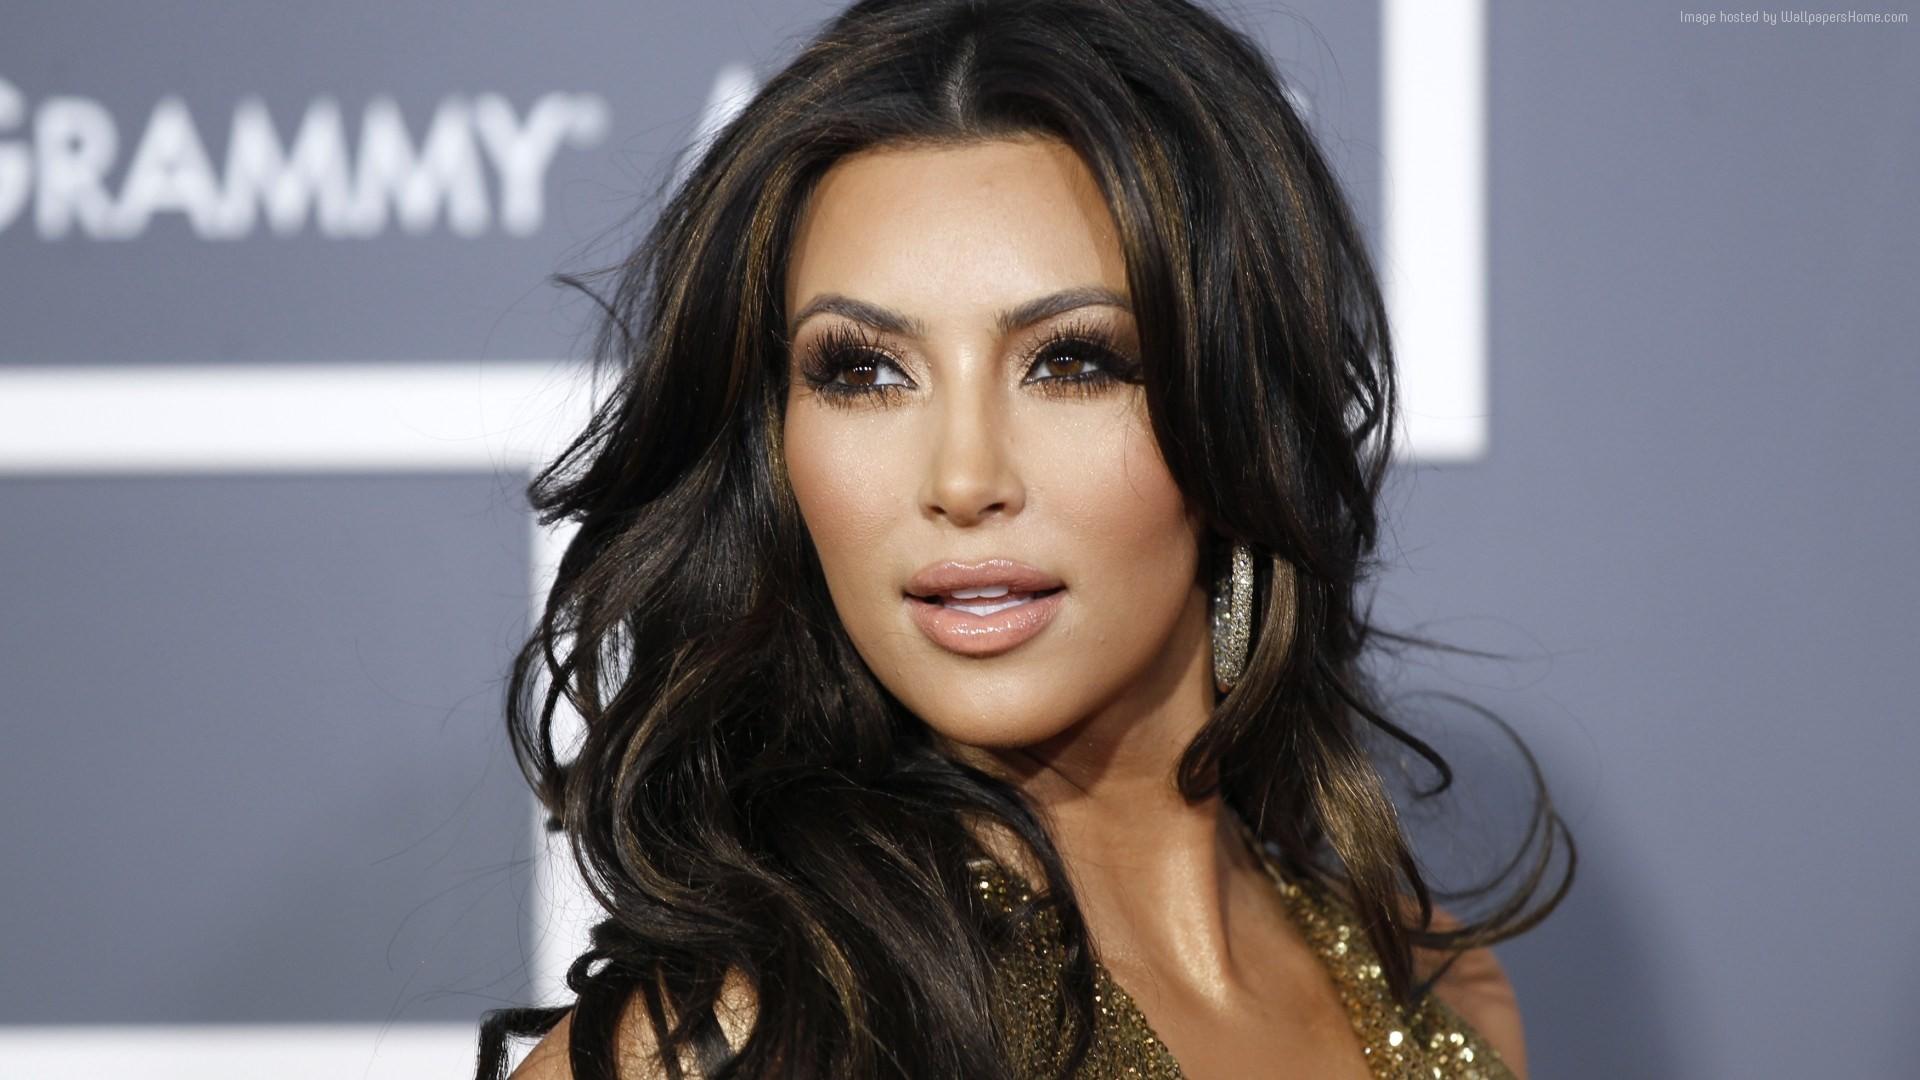 Bollywood wants its stars to look like Pitt, Kardashian: Celebrity  hairstylist